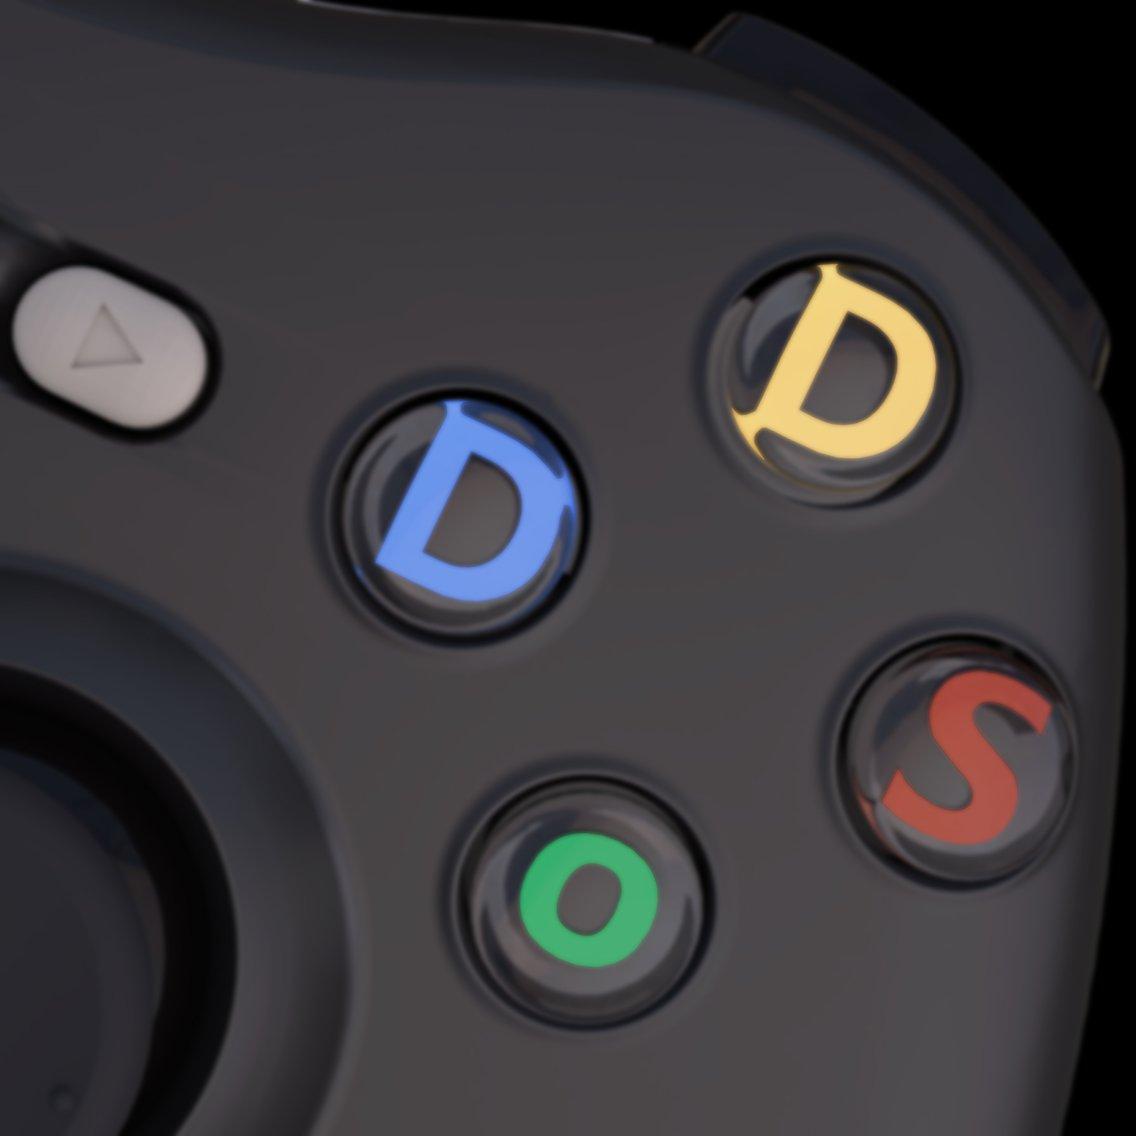 DDOS Muchachos - immagine di copertina